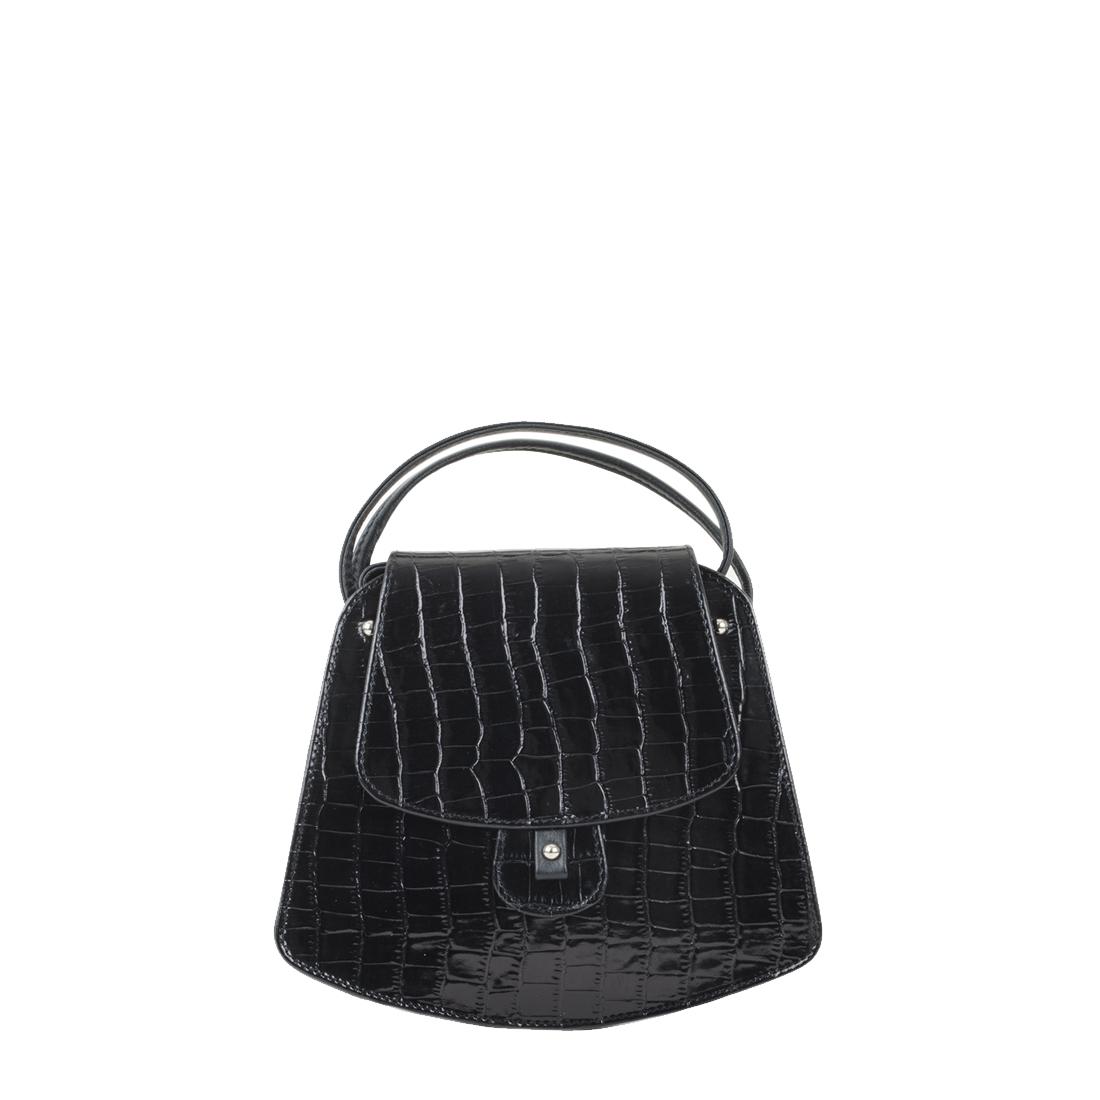 Clara Black Crocodile Print Leather Shoulder Bag